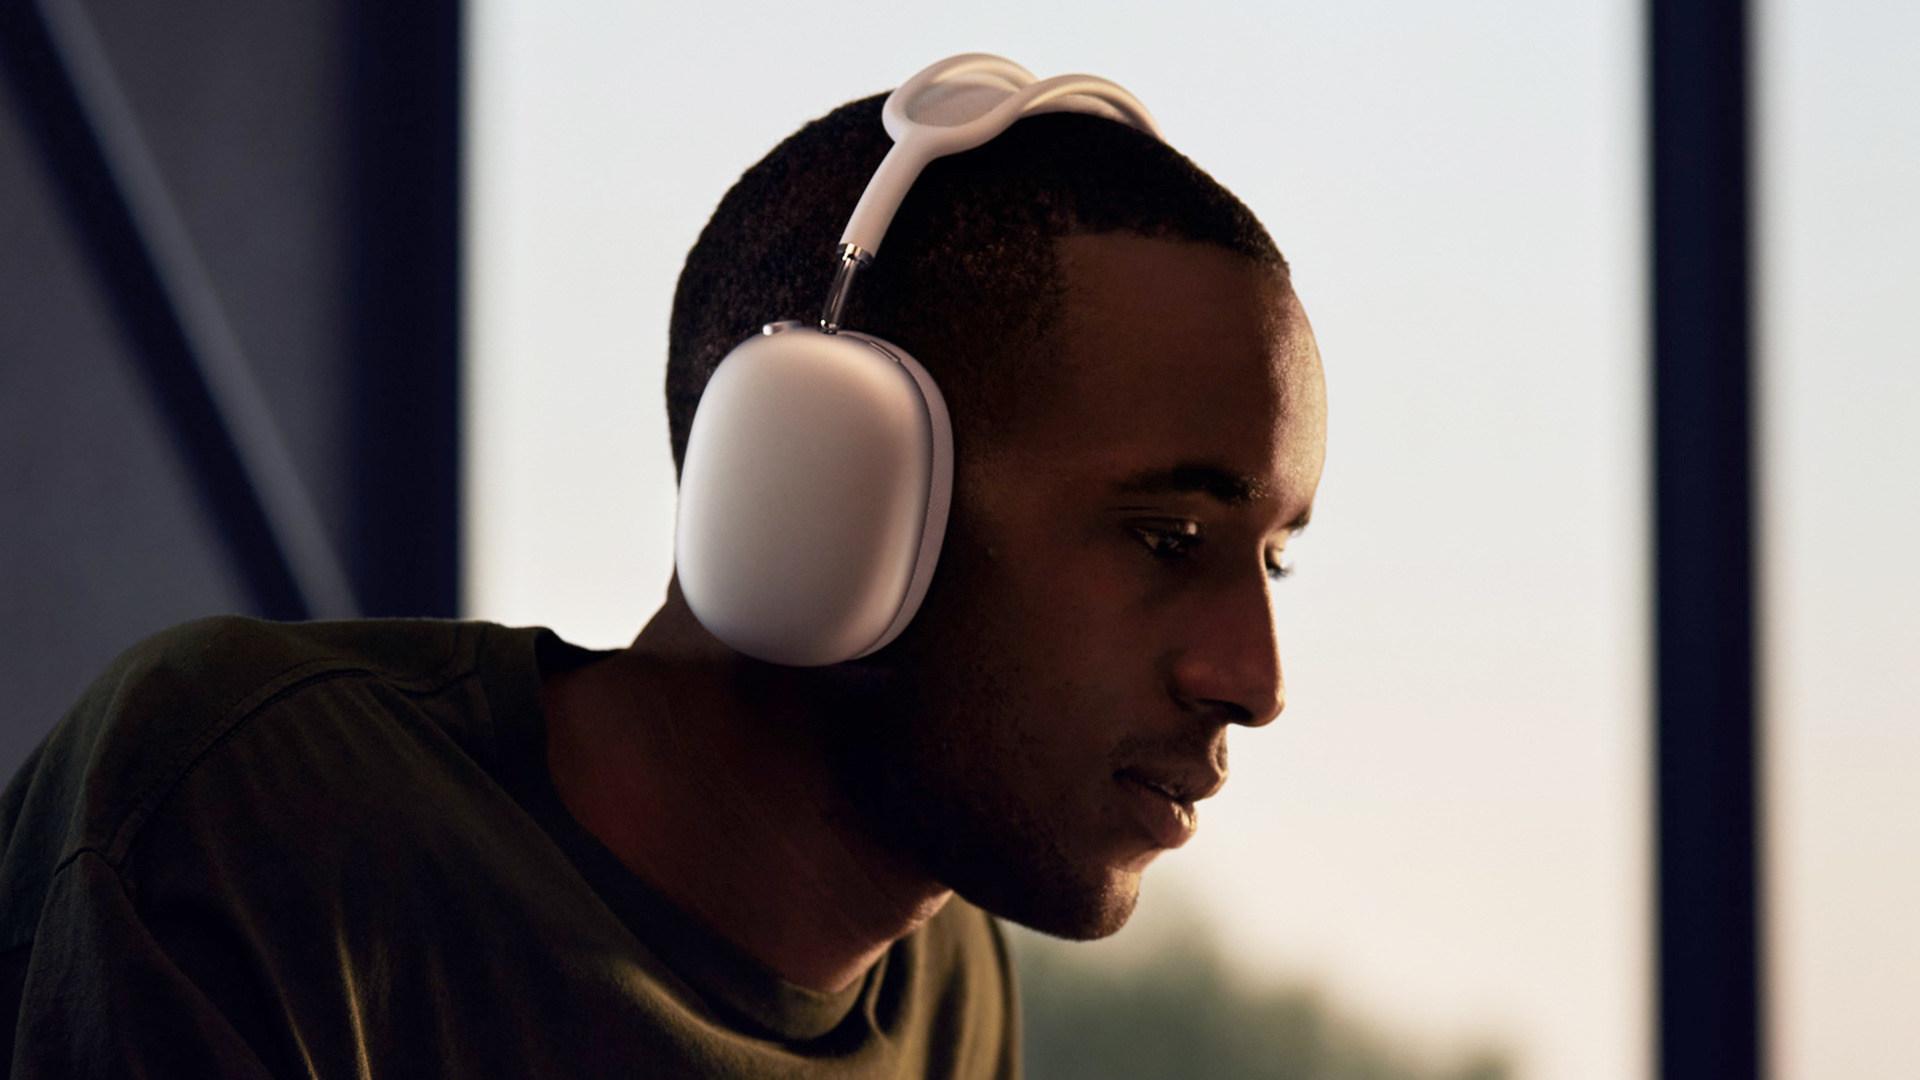 Apple, Headset, Kopfhörer, Bluetooth, Drahtlos, kabellos, Ohrhörer, ANC, Geräuschunterdrückung, Active Noise Cancelling, Active Noise Cancellation, Over-Ear, AirPods Max